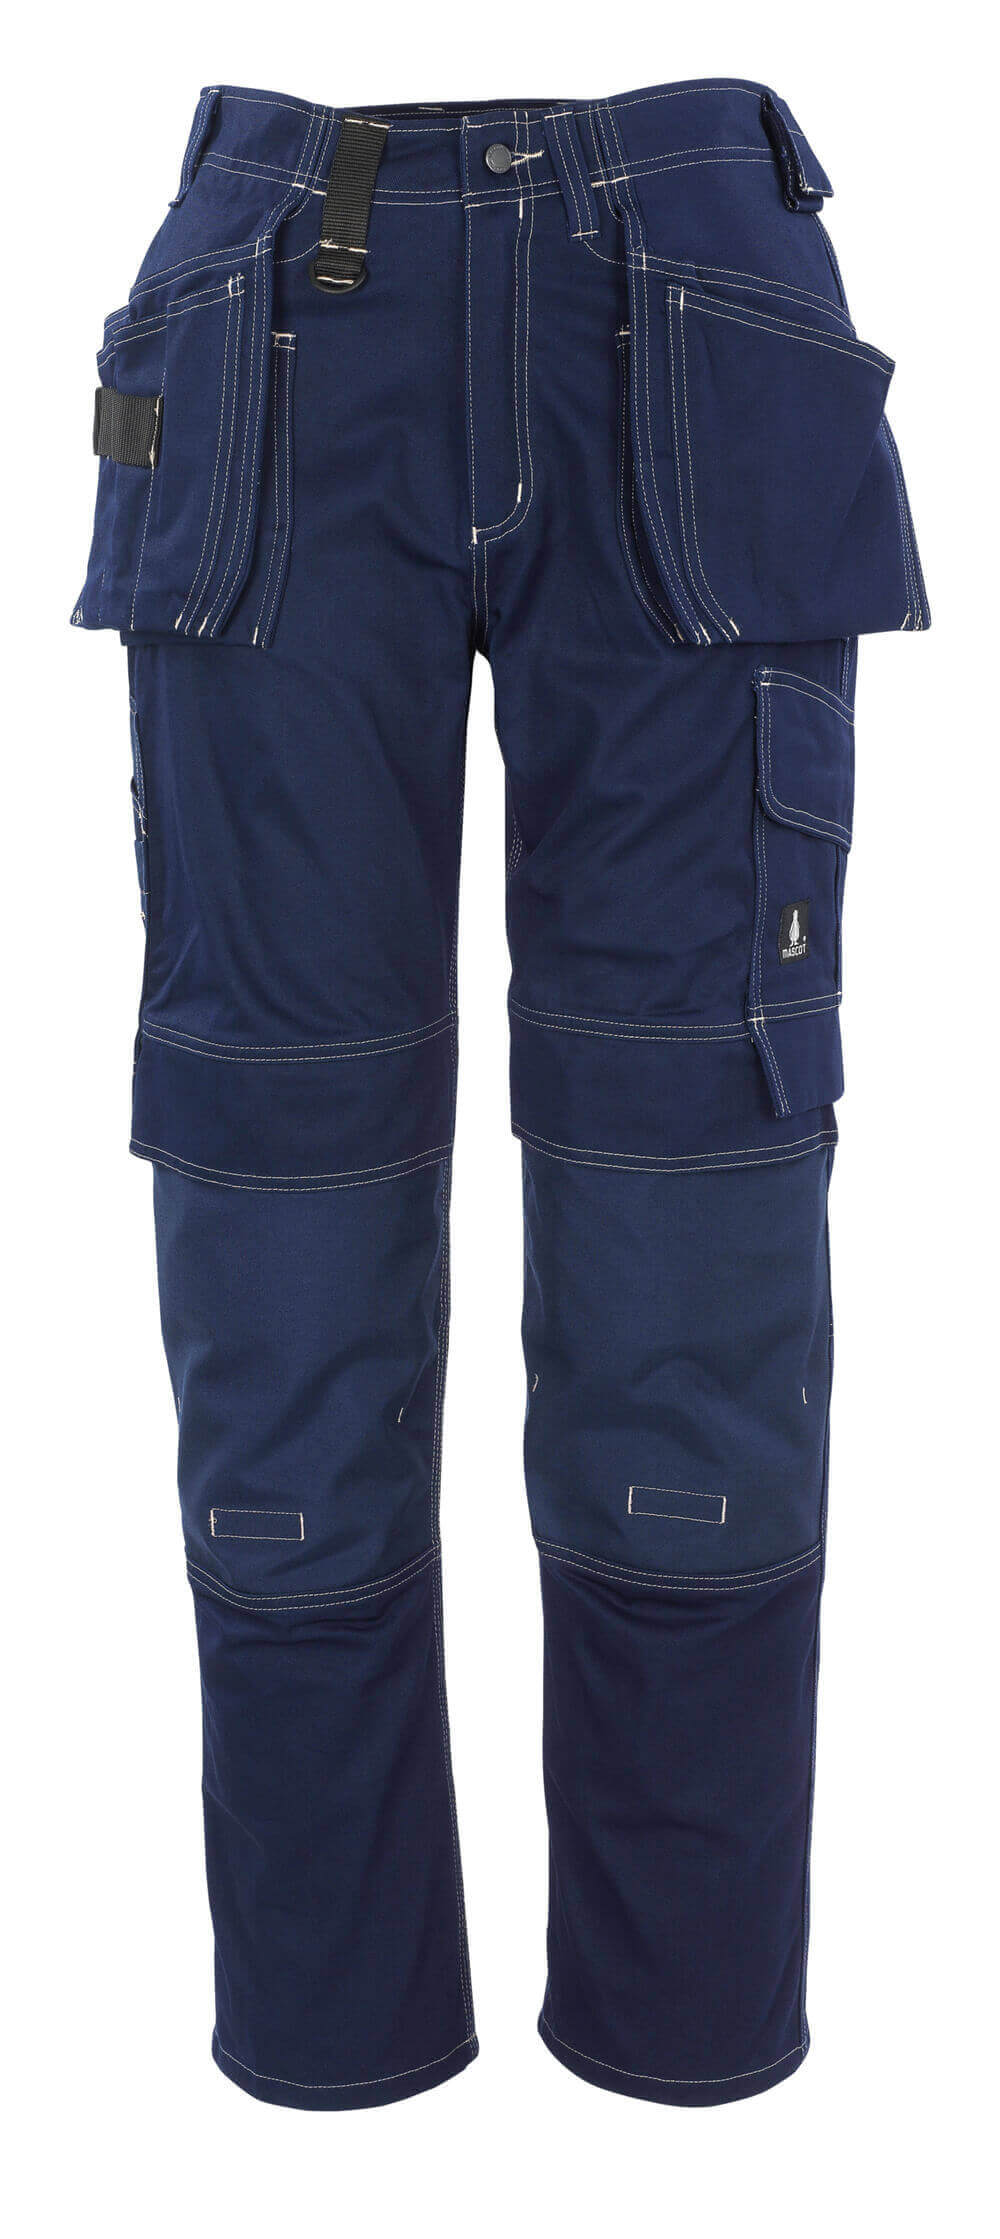 06131-630-01 Pantalones con bolsillos tipo funda - azul marino